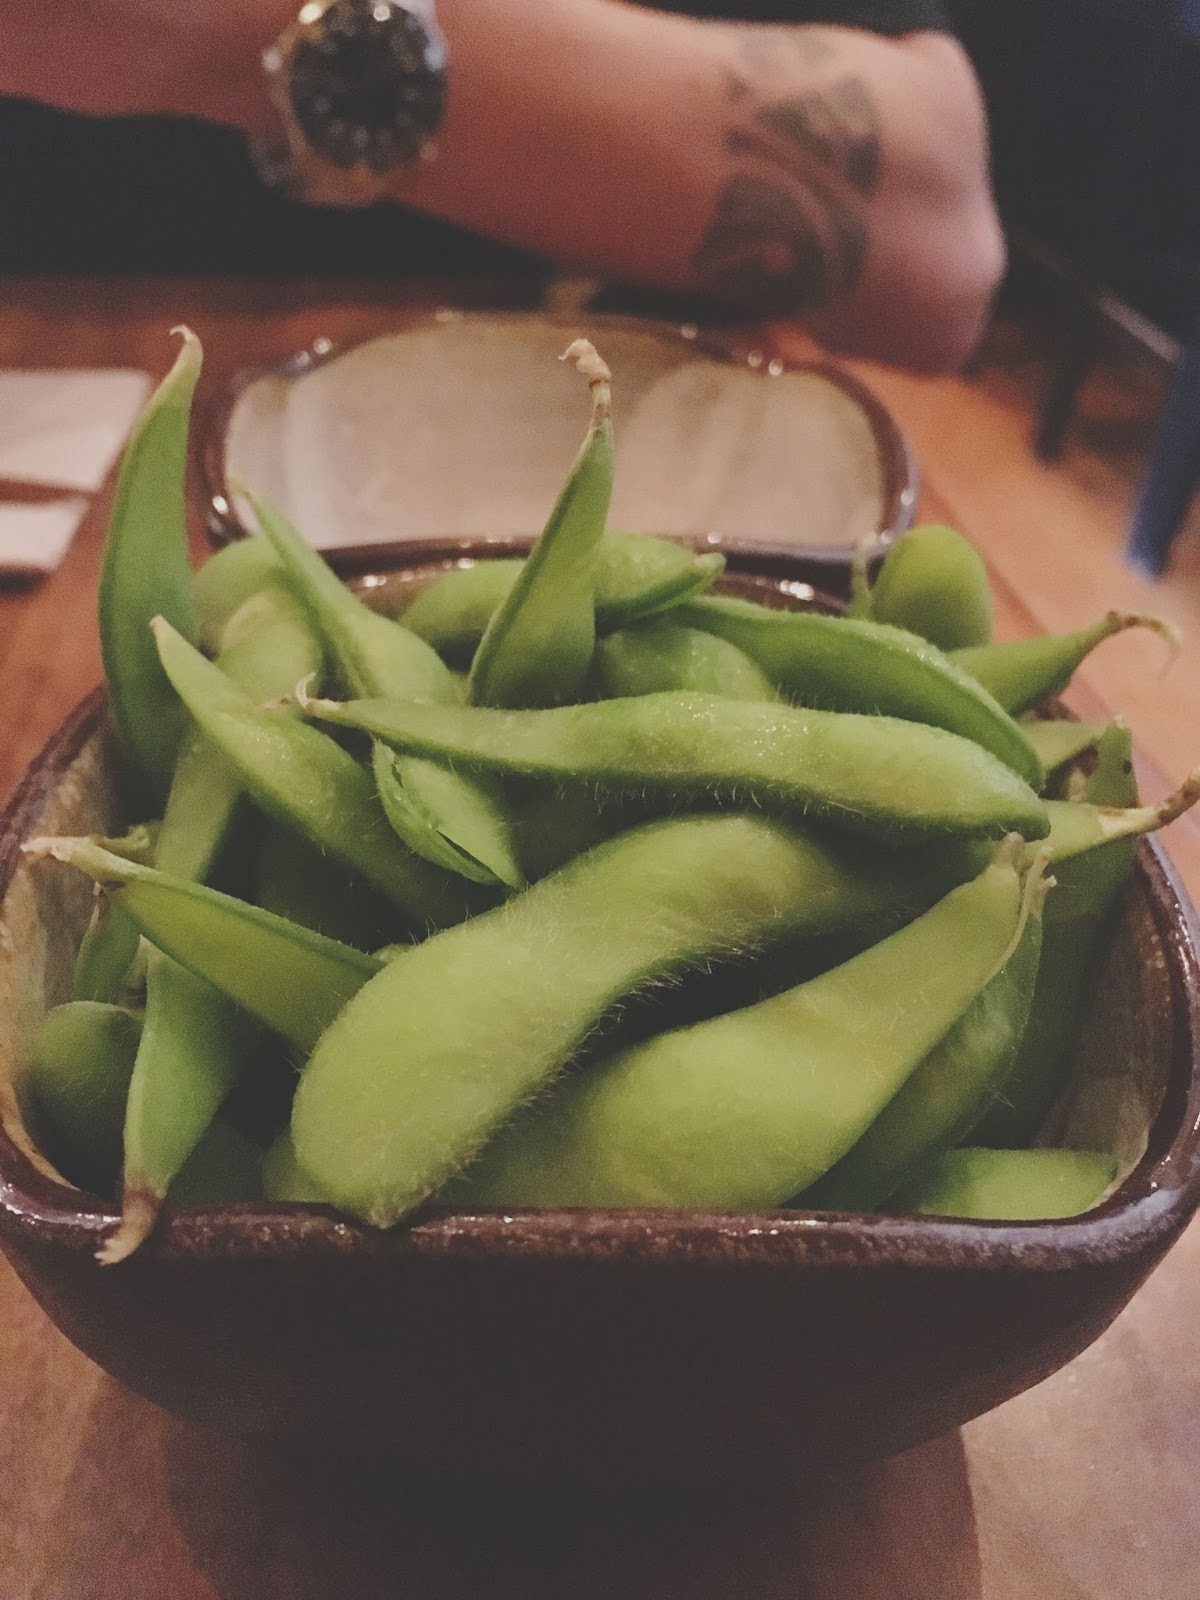 edamame at Saru Sushi - a restaurant in San Francisco